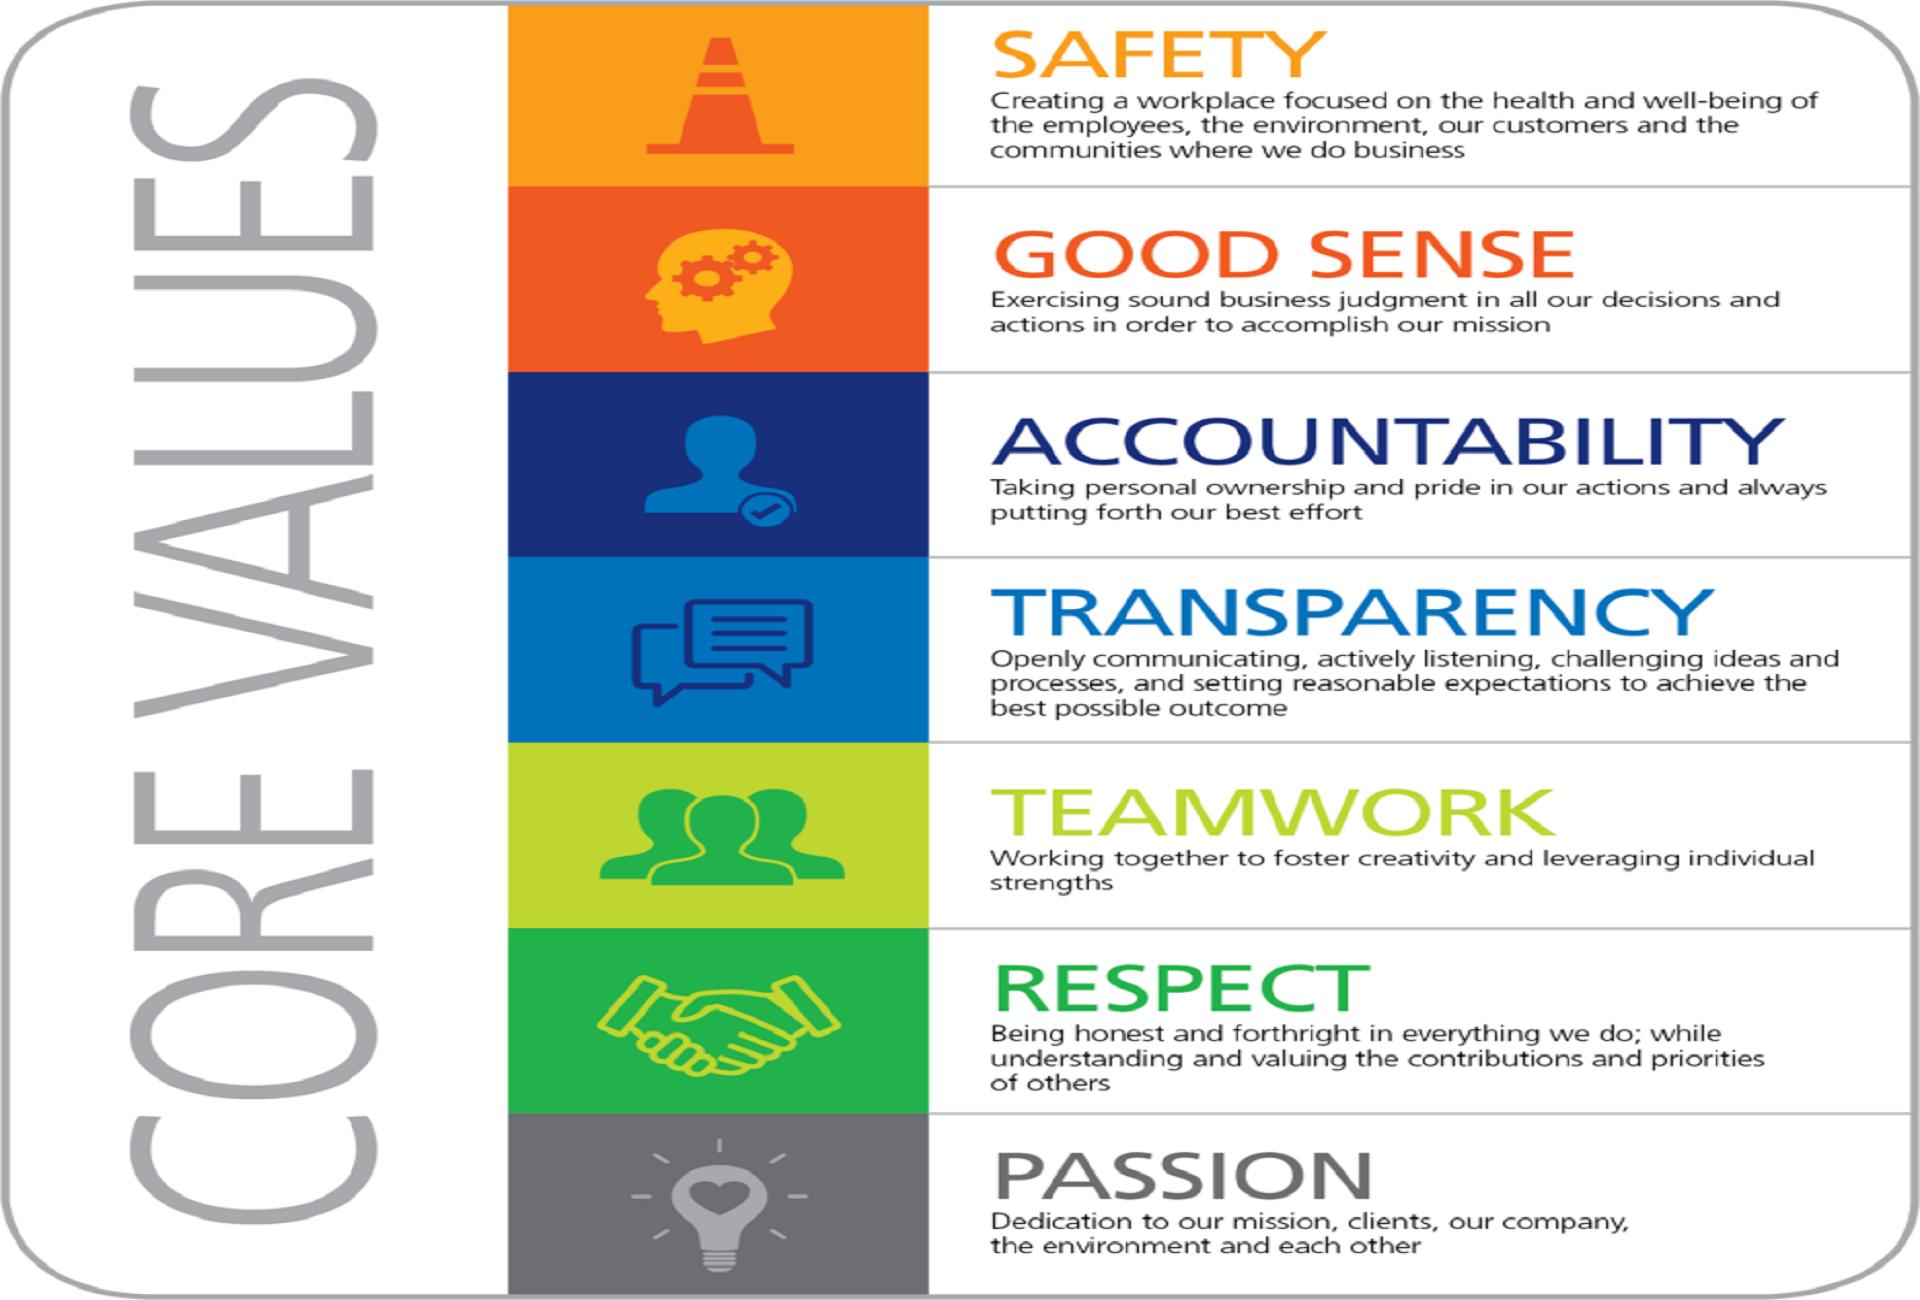 Core-Values-passion